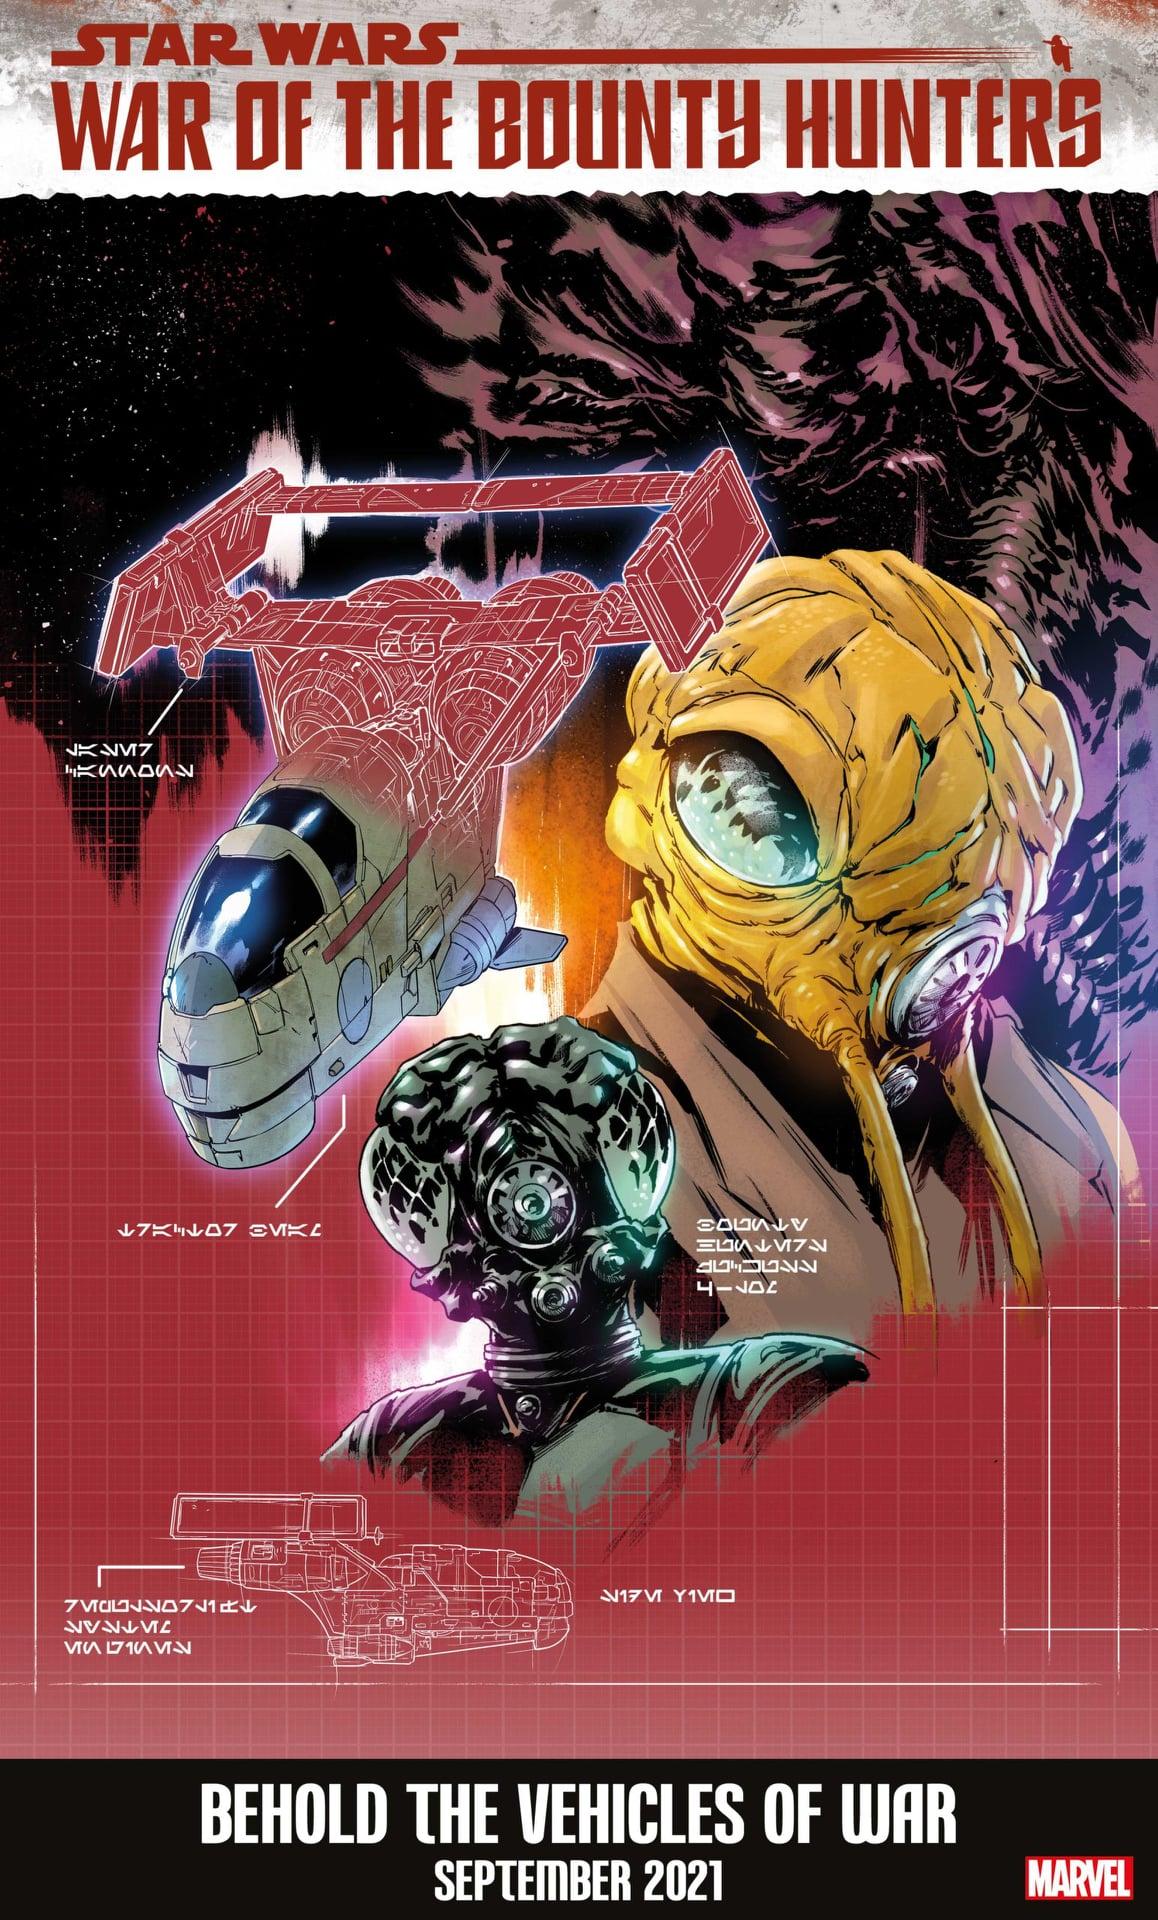 Star Wars War of the Bounty Hunters: Boushh - Villanelli Variant